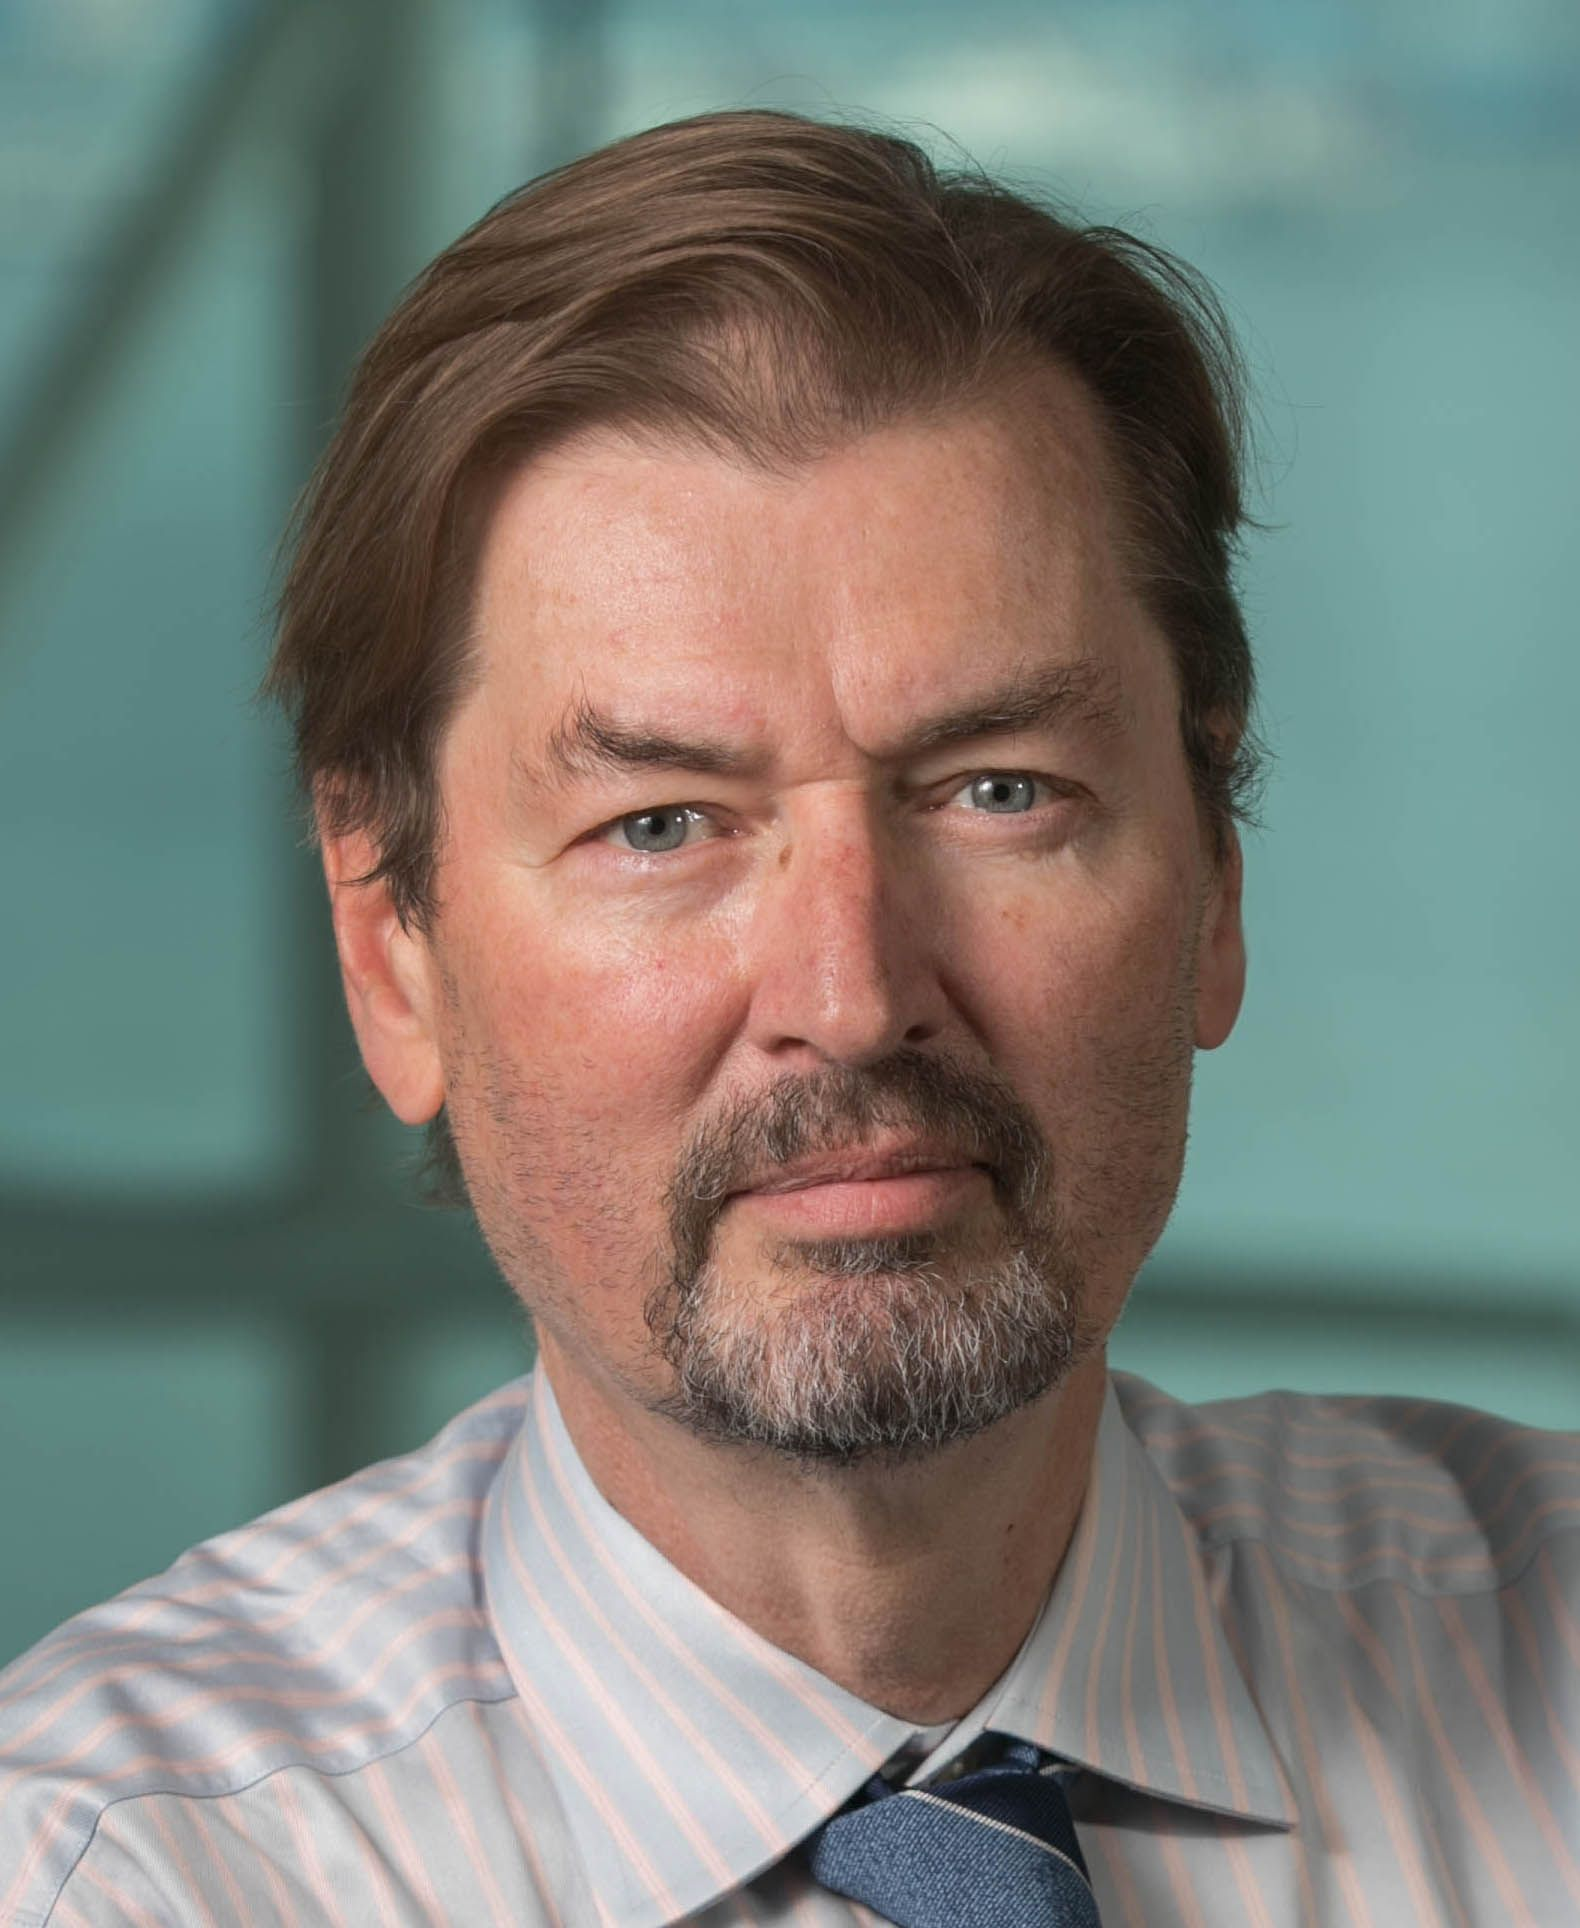 Dr. George Calhoun